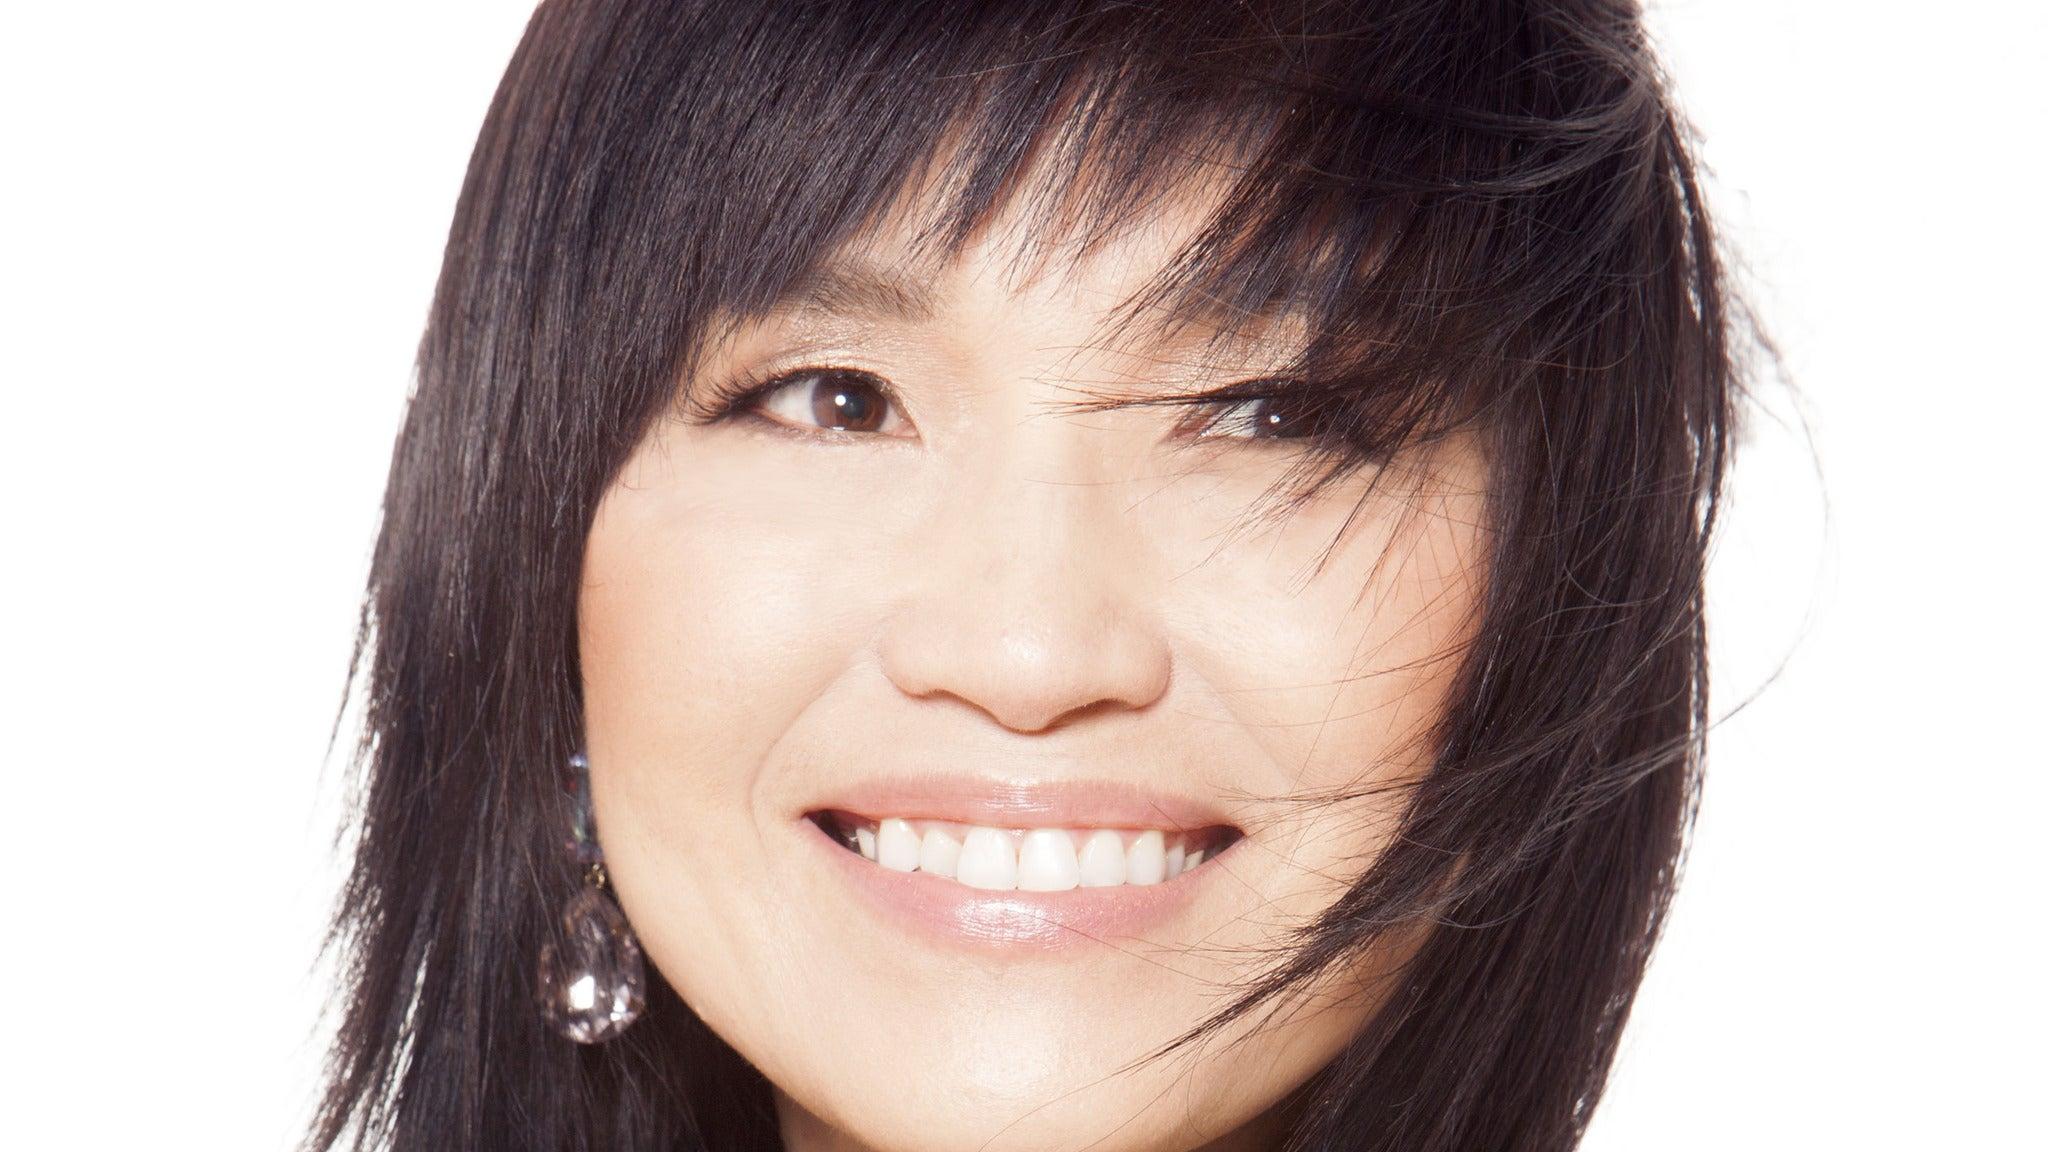 Keiko Matsui at The Rose - Pasadena, CA 91101